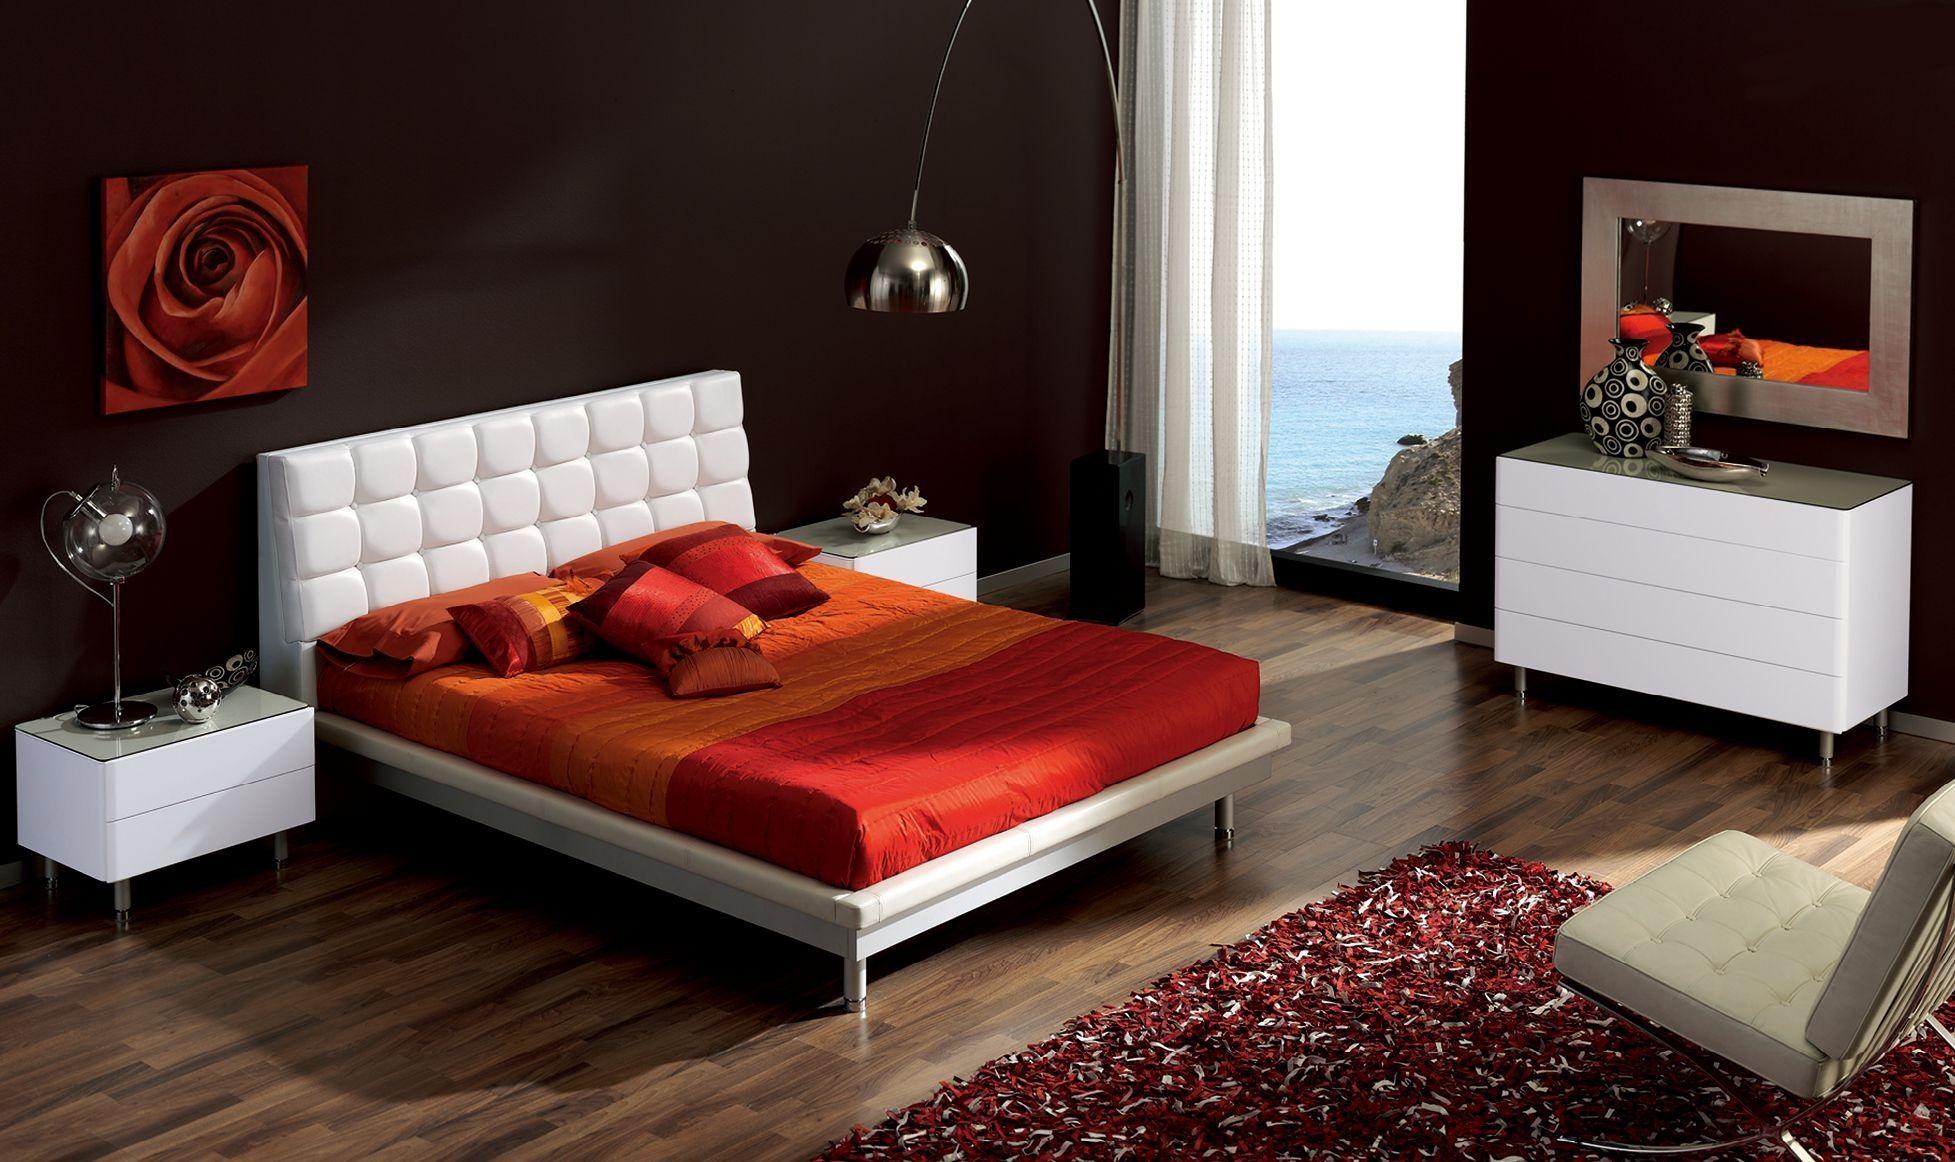 Pin von XLNC Furniture auf Lowest Priced Furniture In Calgary ...